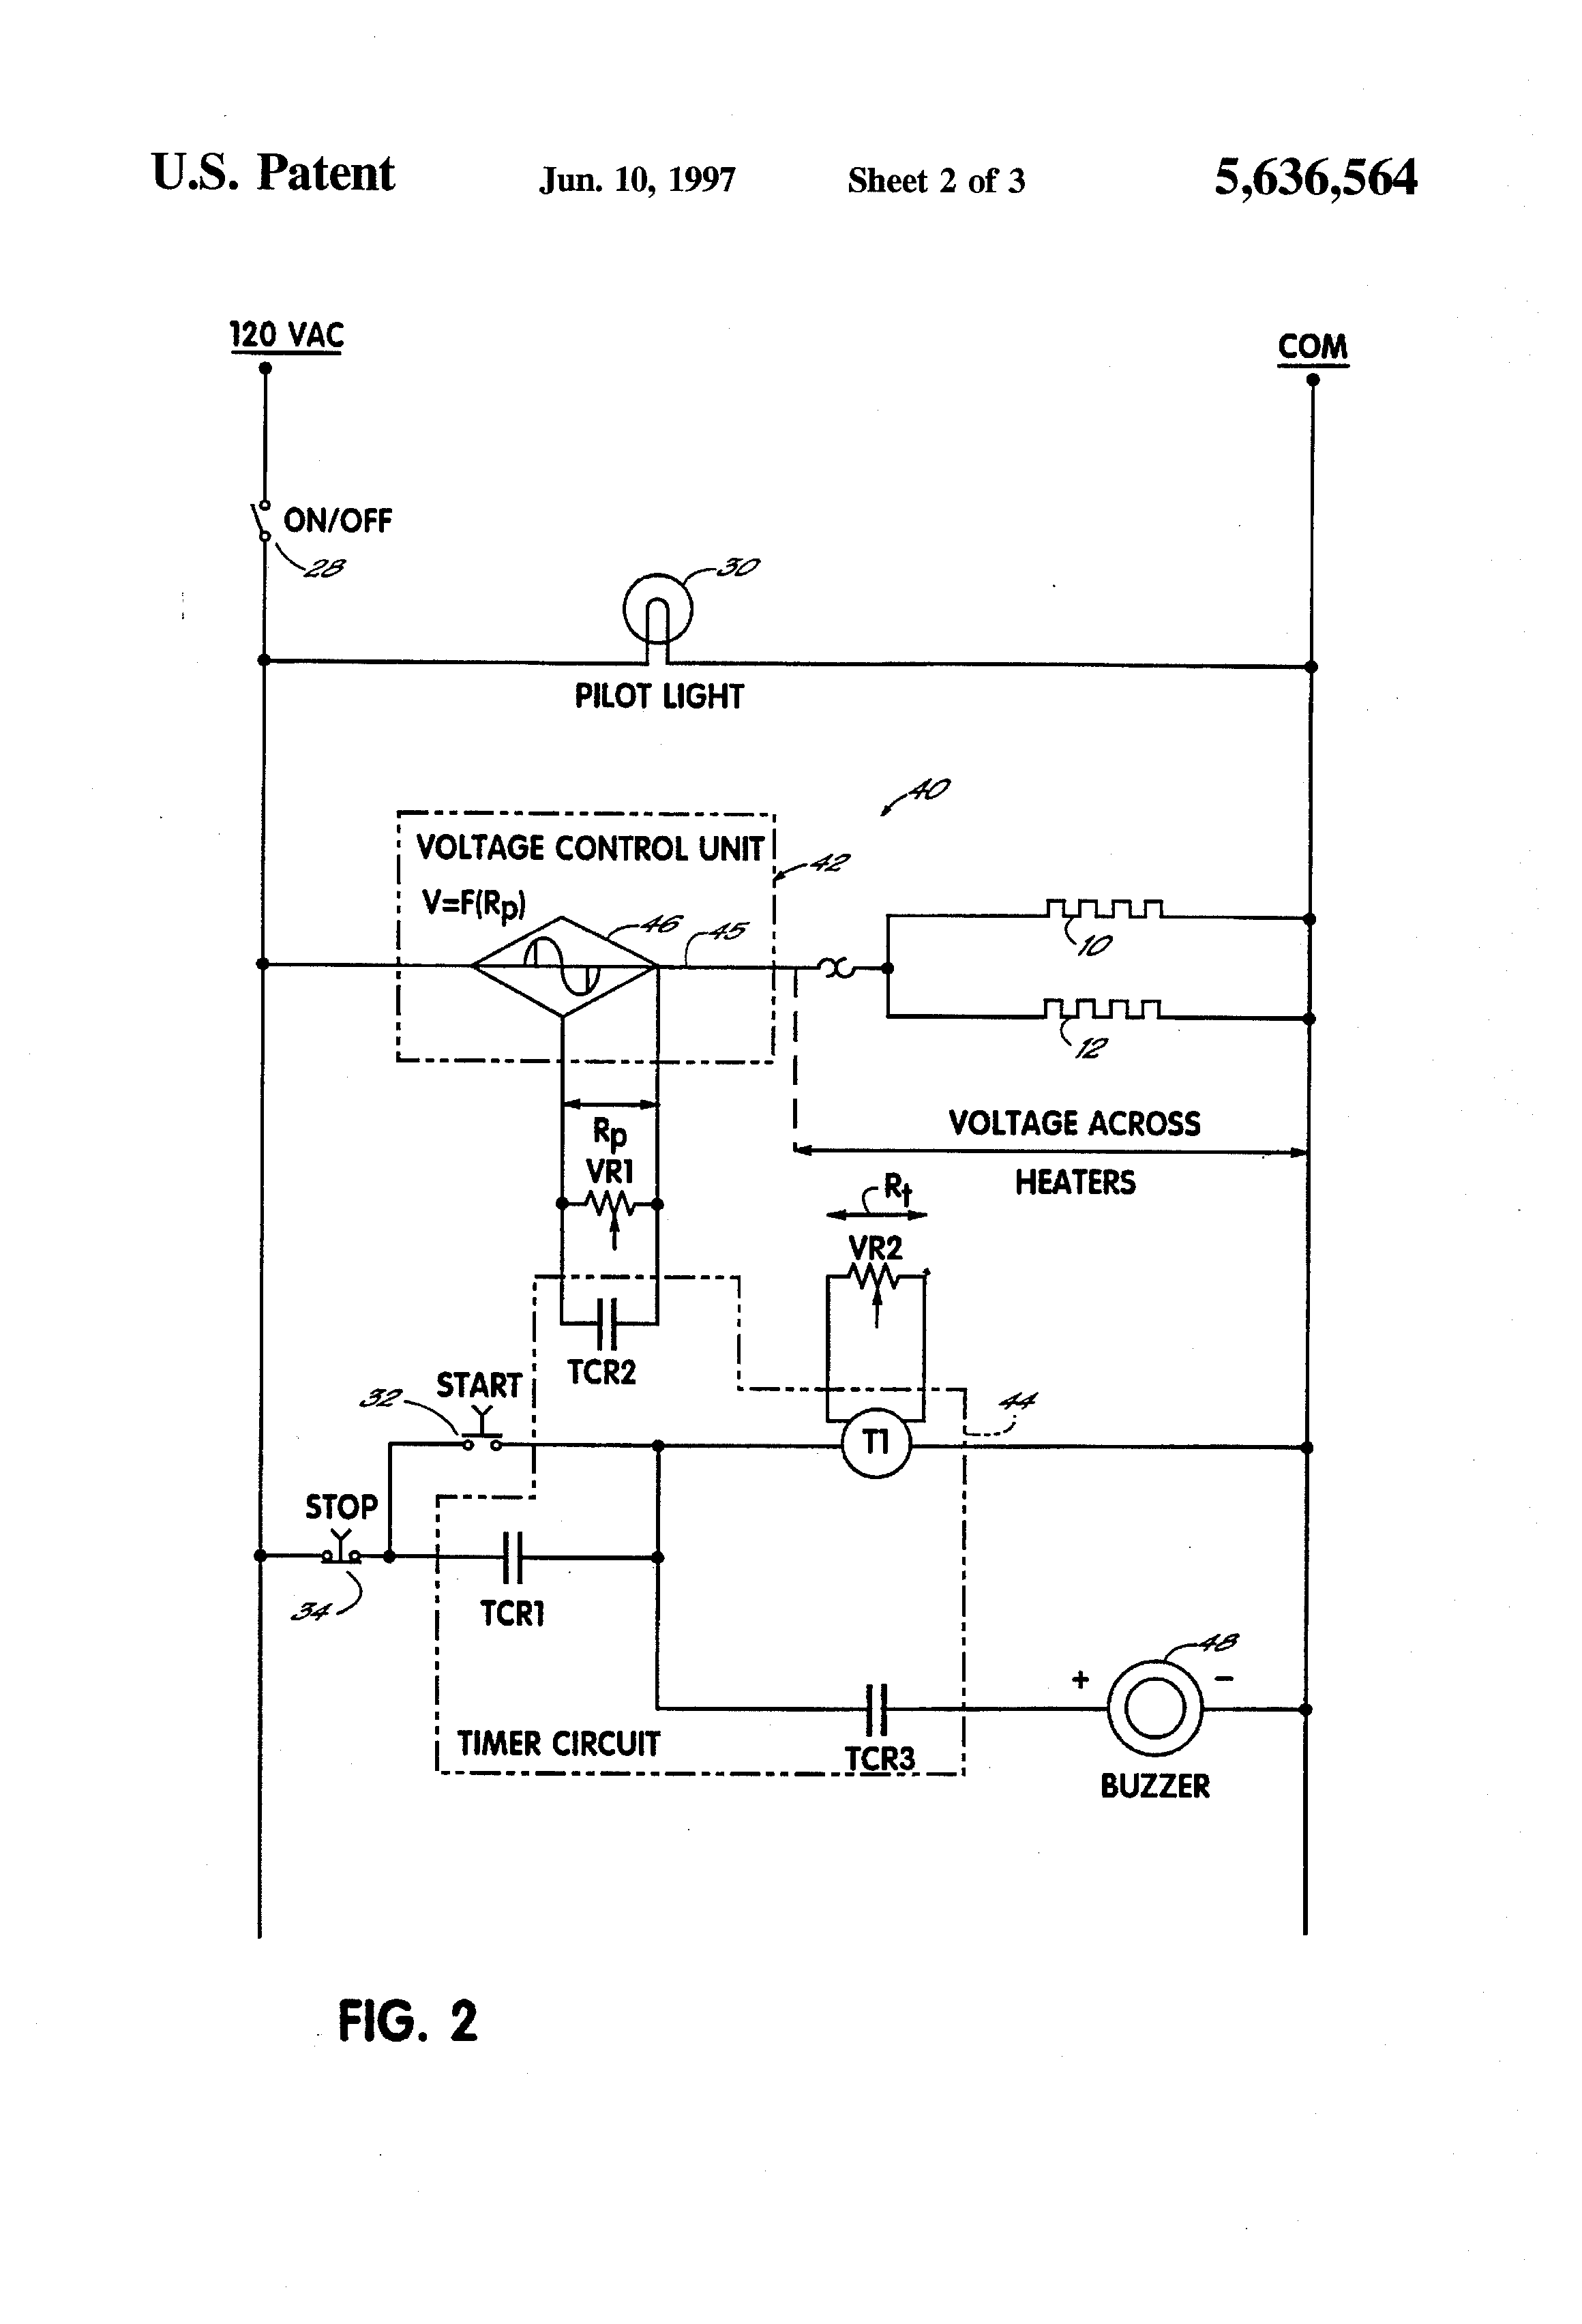 Waffle Iron Wiring Diagram Engine Diagram Water Pump 1997 Ford F 250 Super Duty Begeboy Wiring Diagram Source